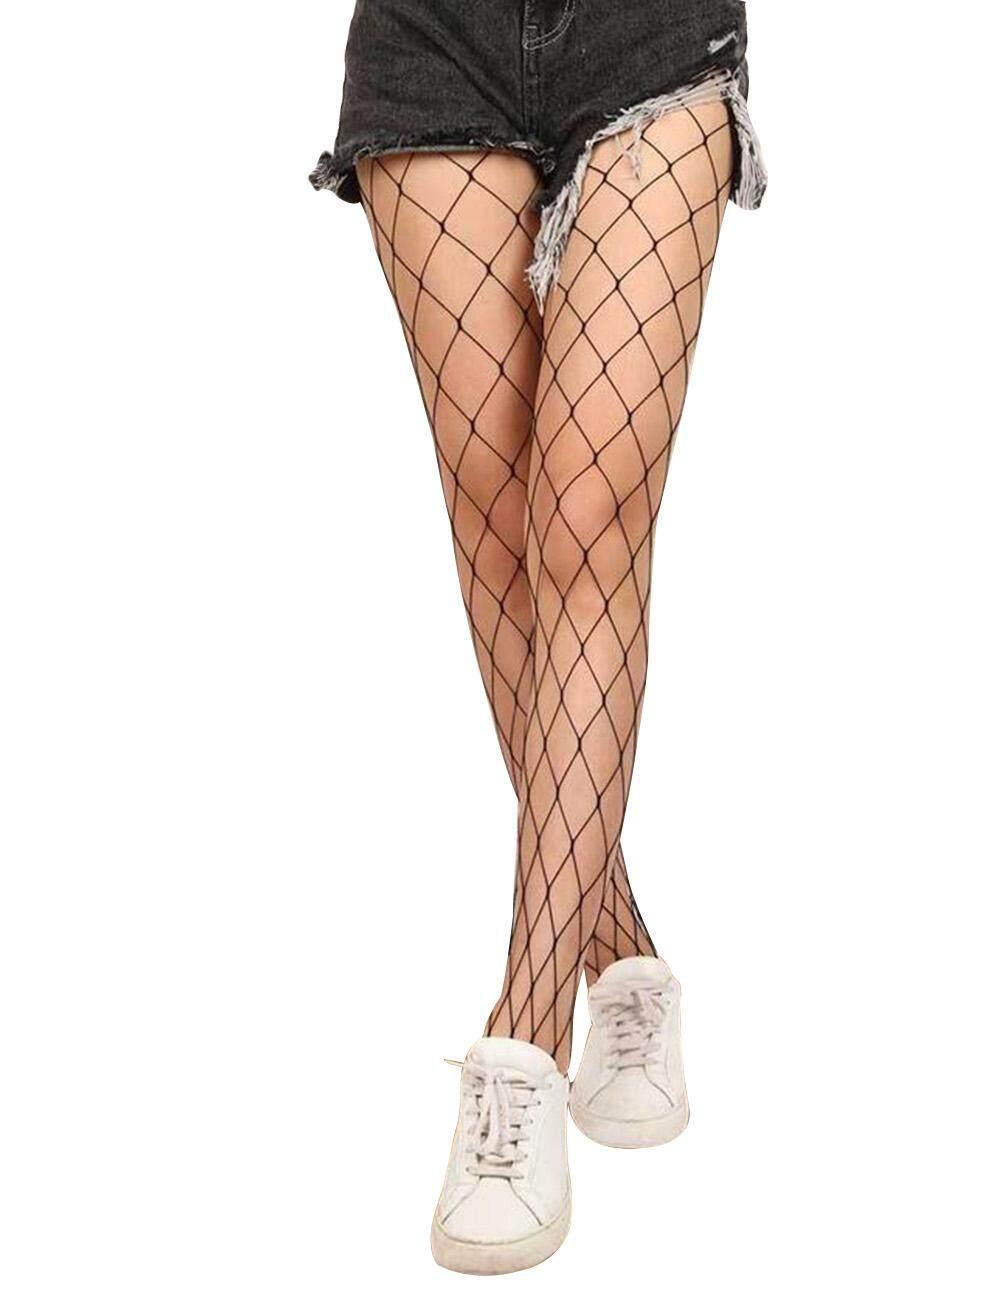 4bf8fa833 Women Sexy Fishnet Top Mesh High Thigh Stockings Hosiery Pantyhose Long  Socks